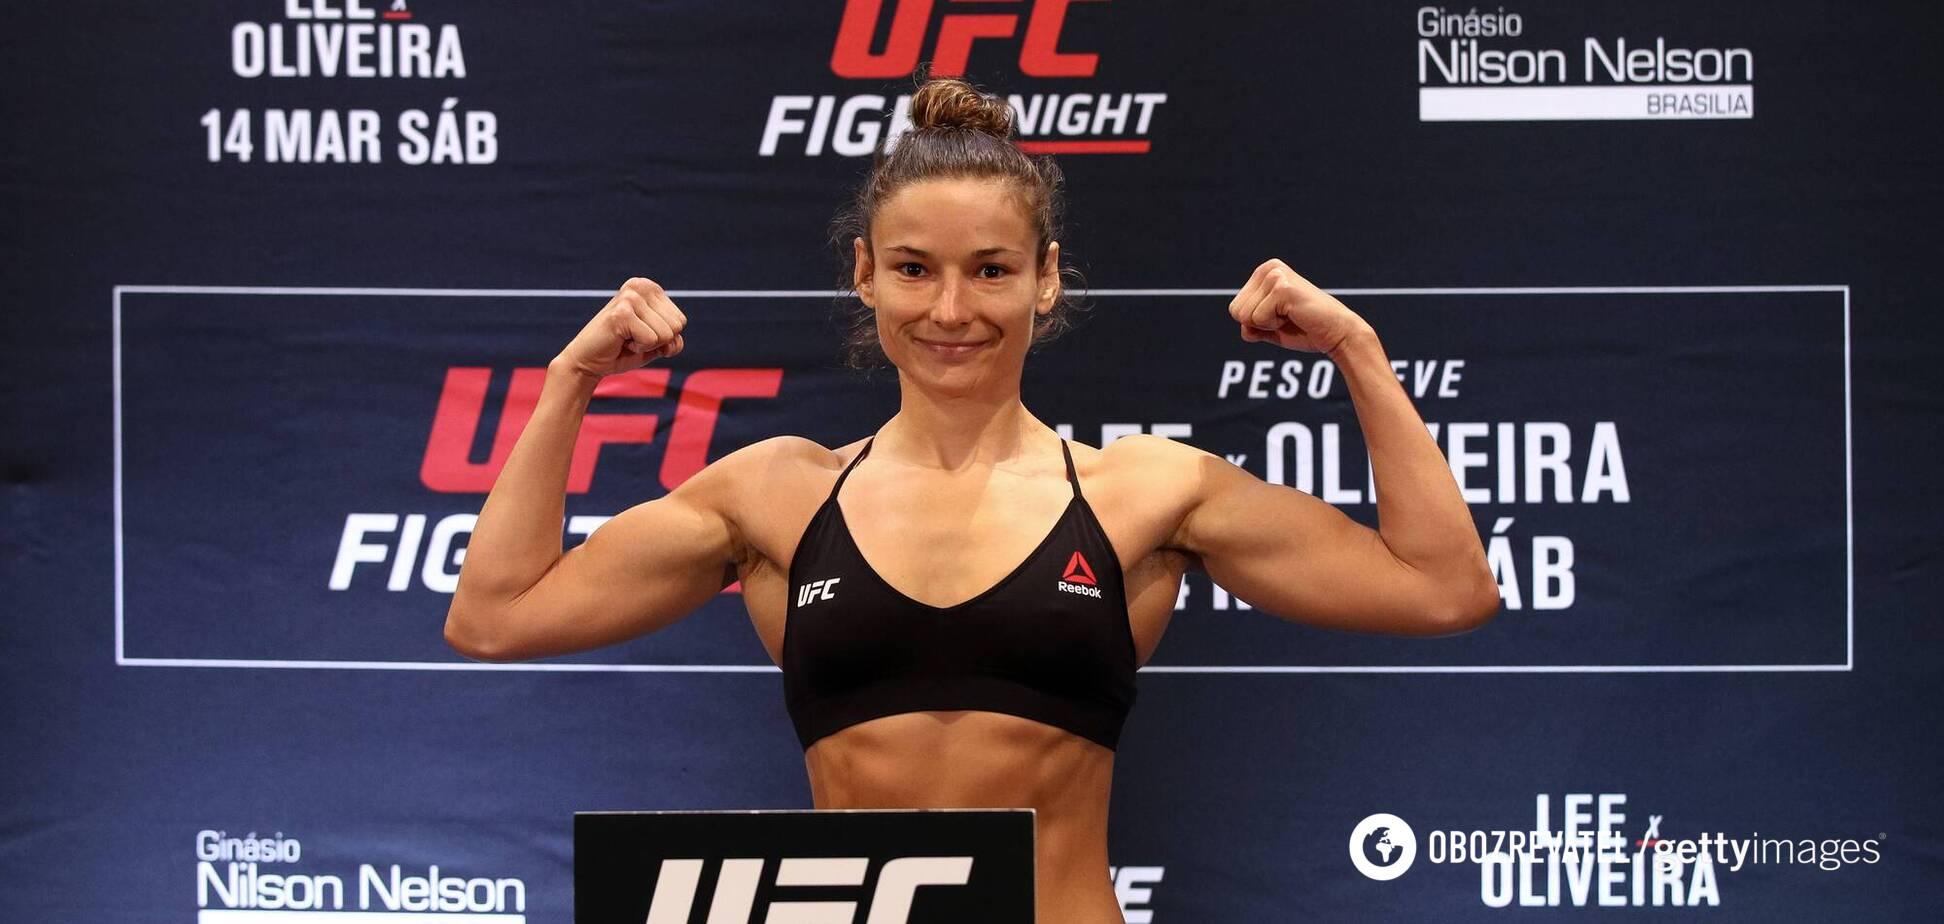 Марина Мороз назвав фаворита в бою Грицай - Усик